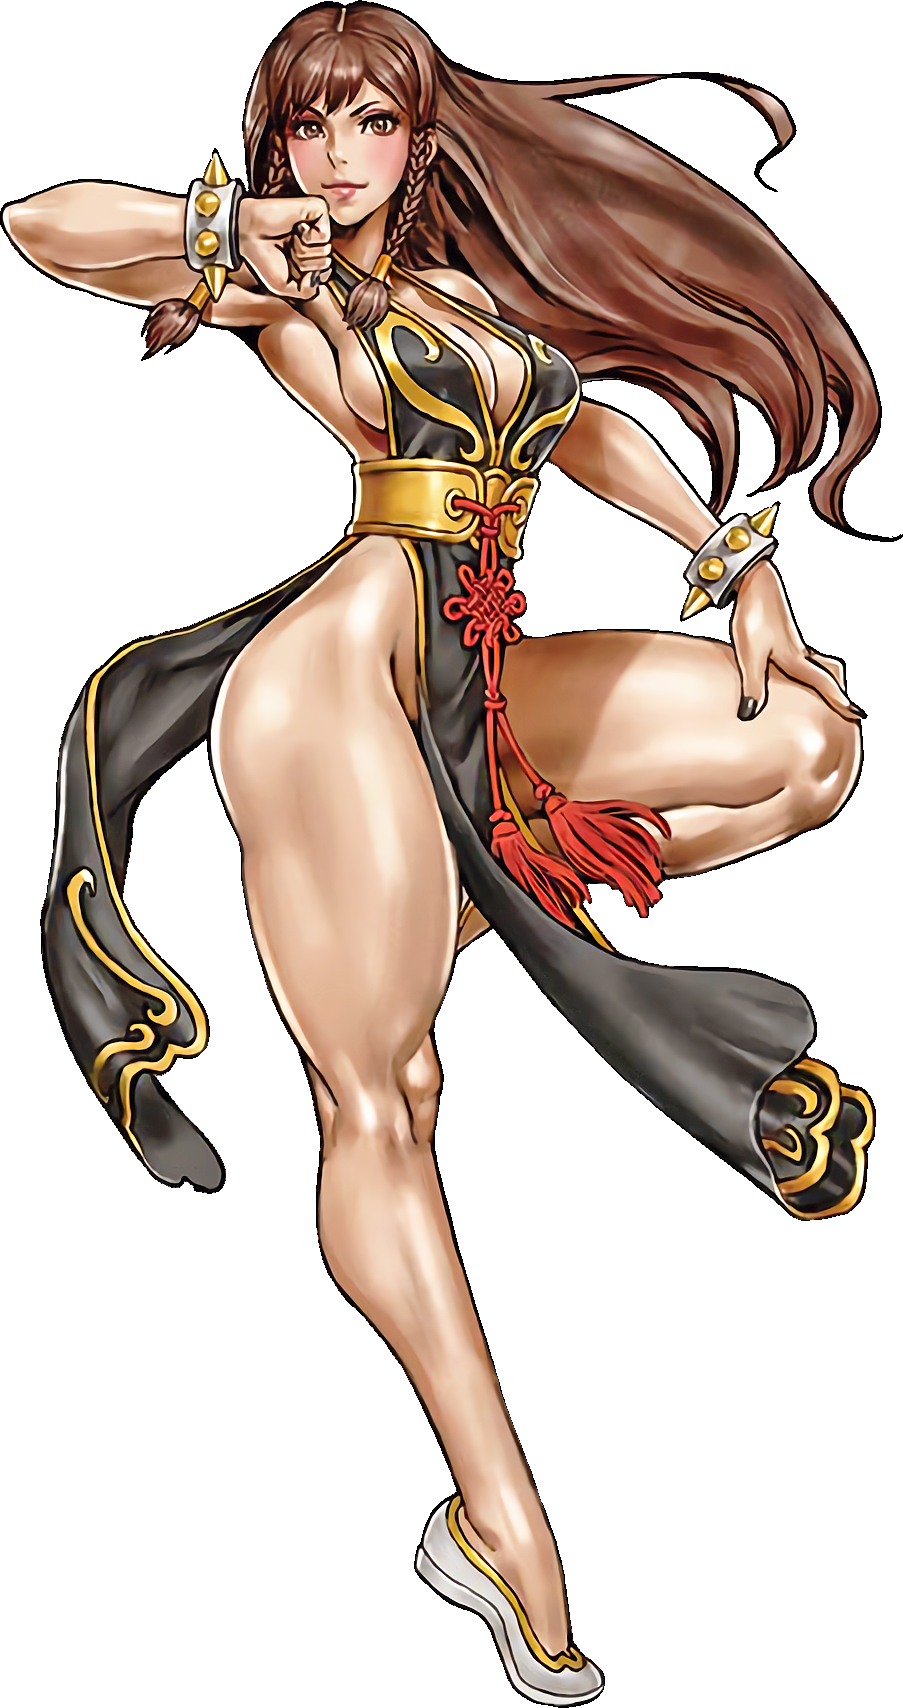 Street Fighter Bishoujo Chun Li Alternate Costume By Hes6789 On